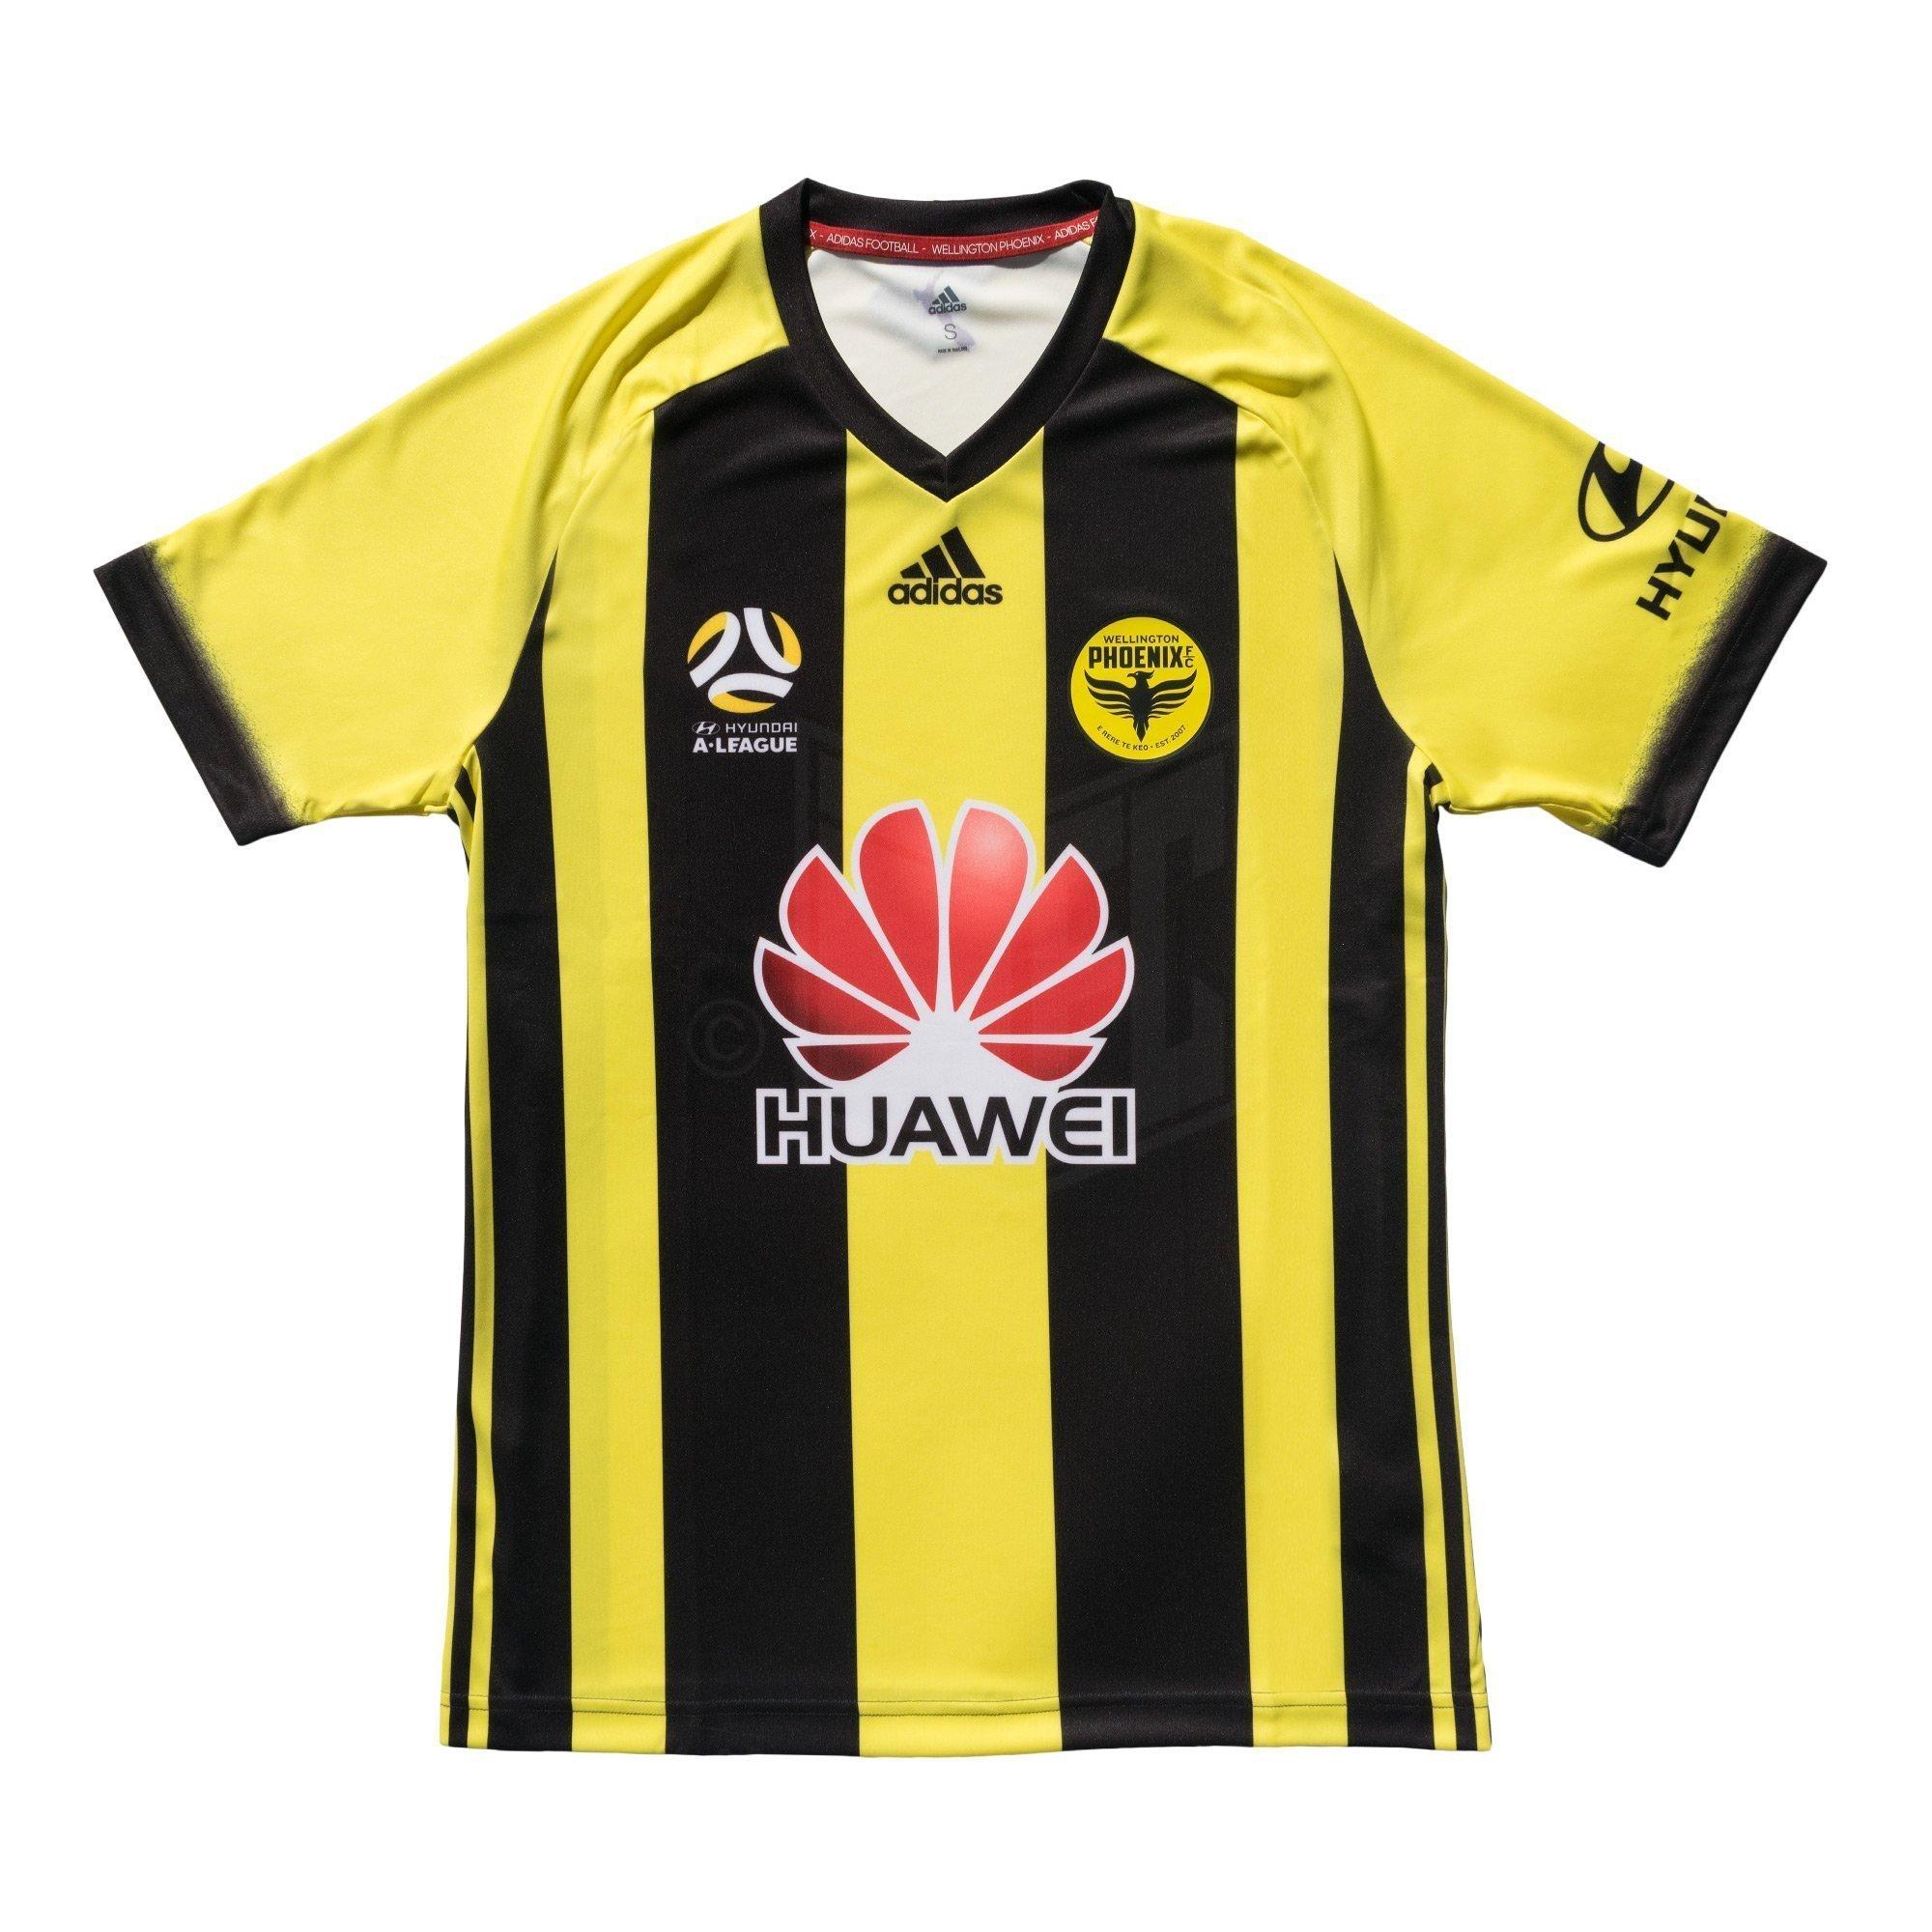 ... Wellington Phoenix 17 18 Adidas Away Kit · Click to enlarge image  wellington phoenix 17 18 adidas home kit a.jpg ... 4240e7e3c